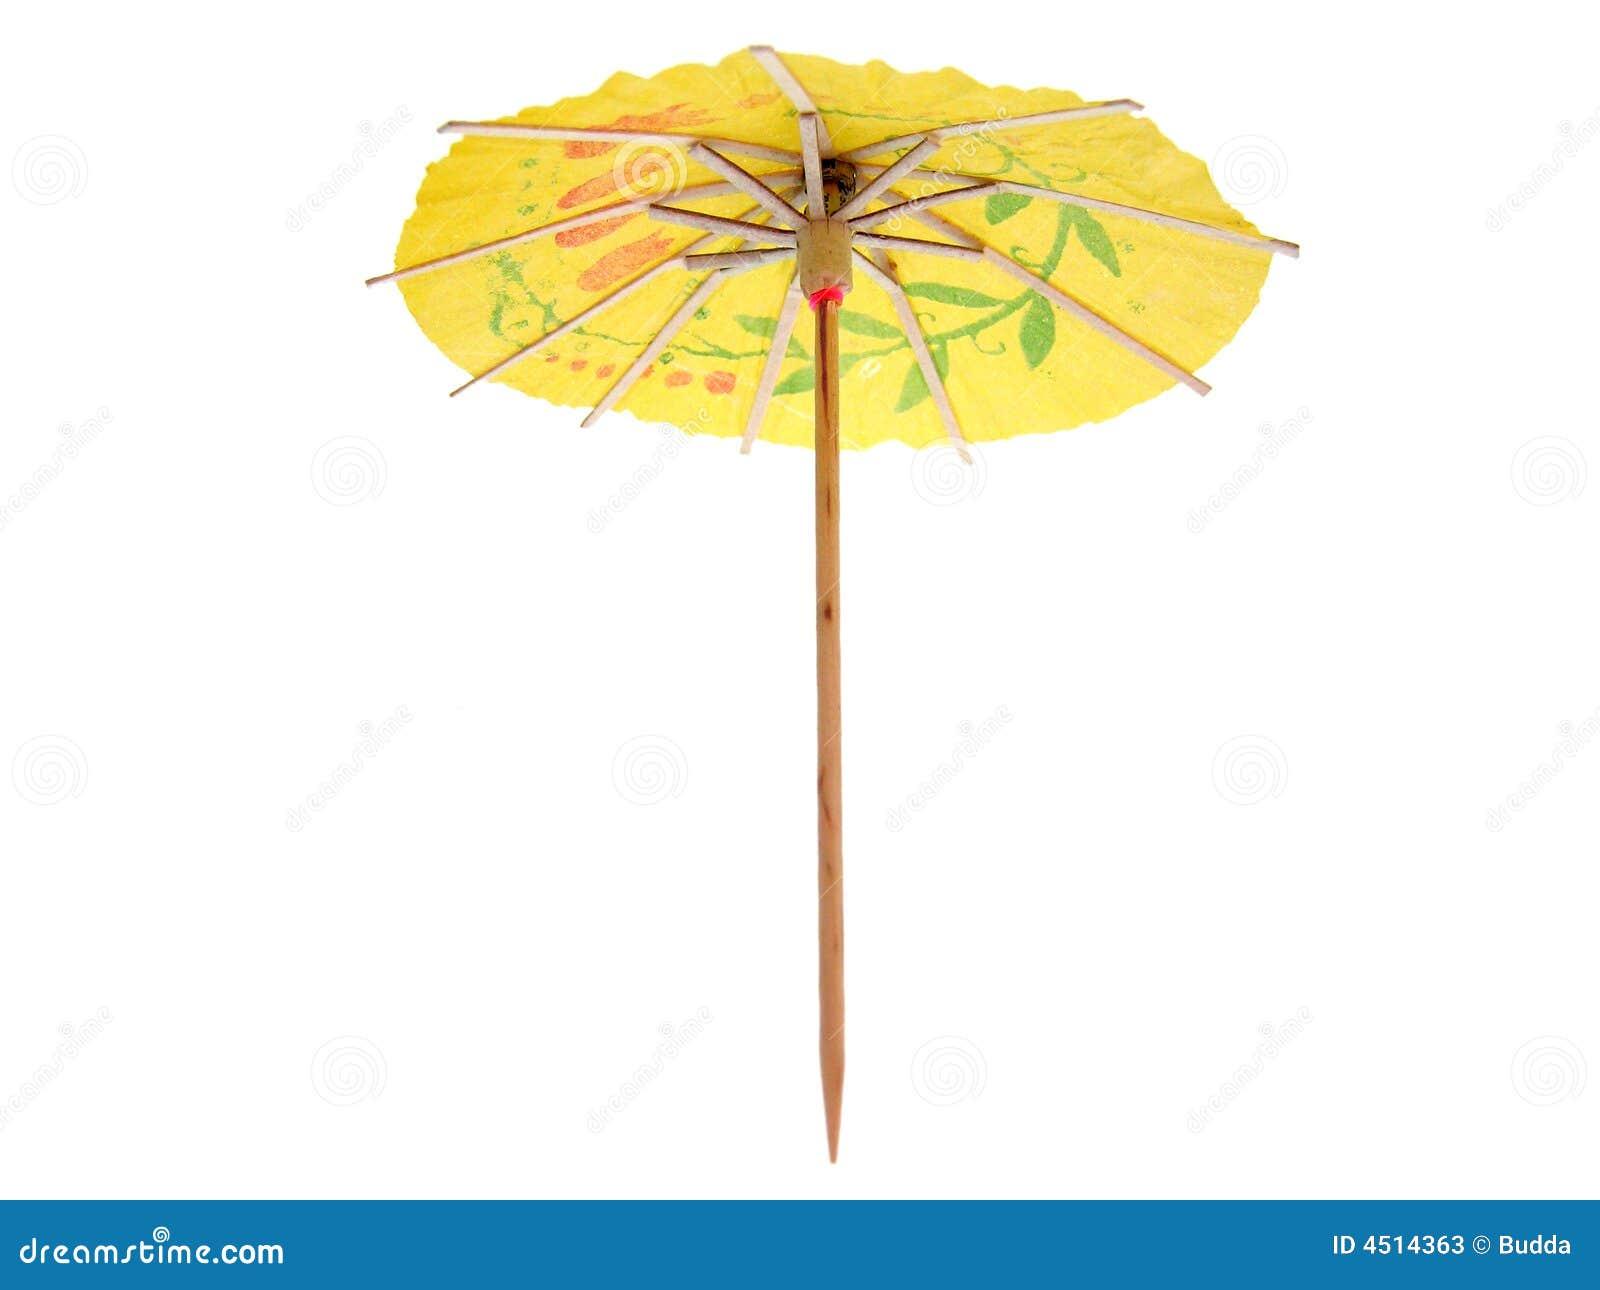 cocktail umbrella stock photos image 4514363